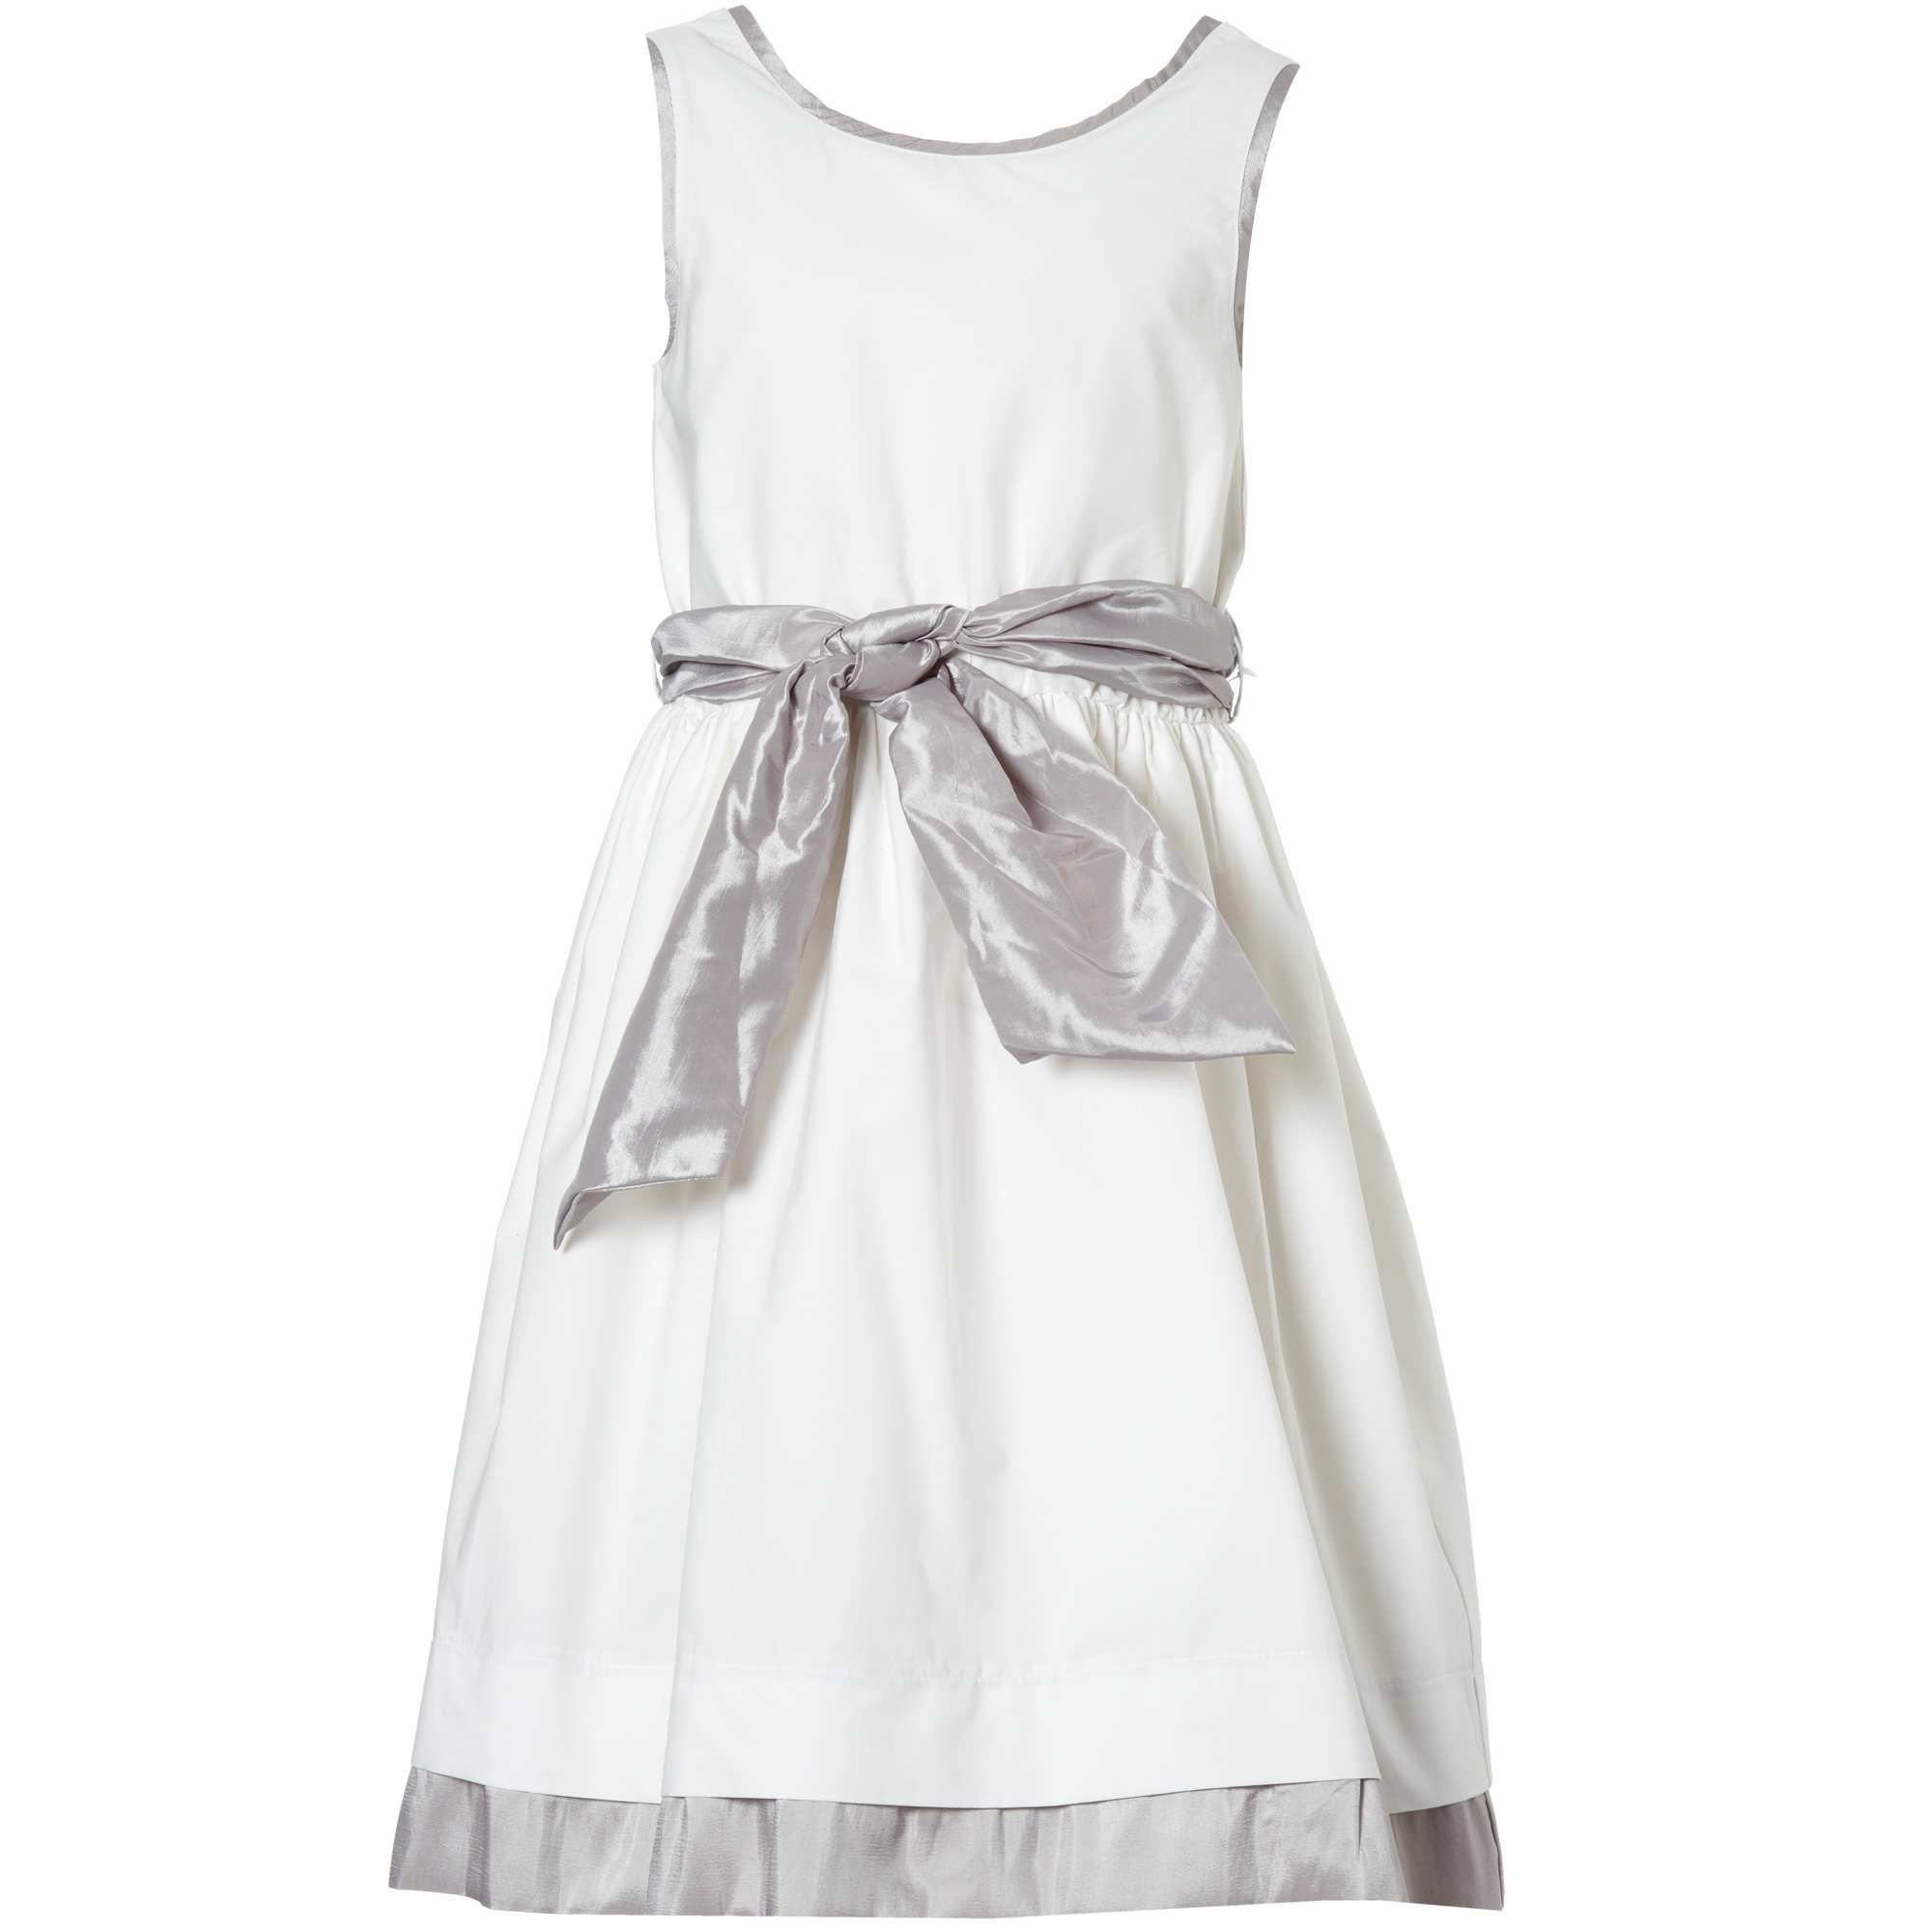 robe de c r monie jupe bouffante fille kiabi 20 00 florence pinterest florence